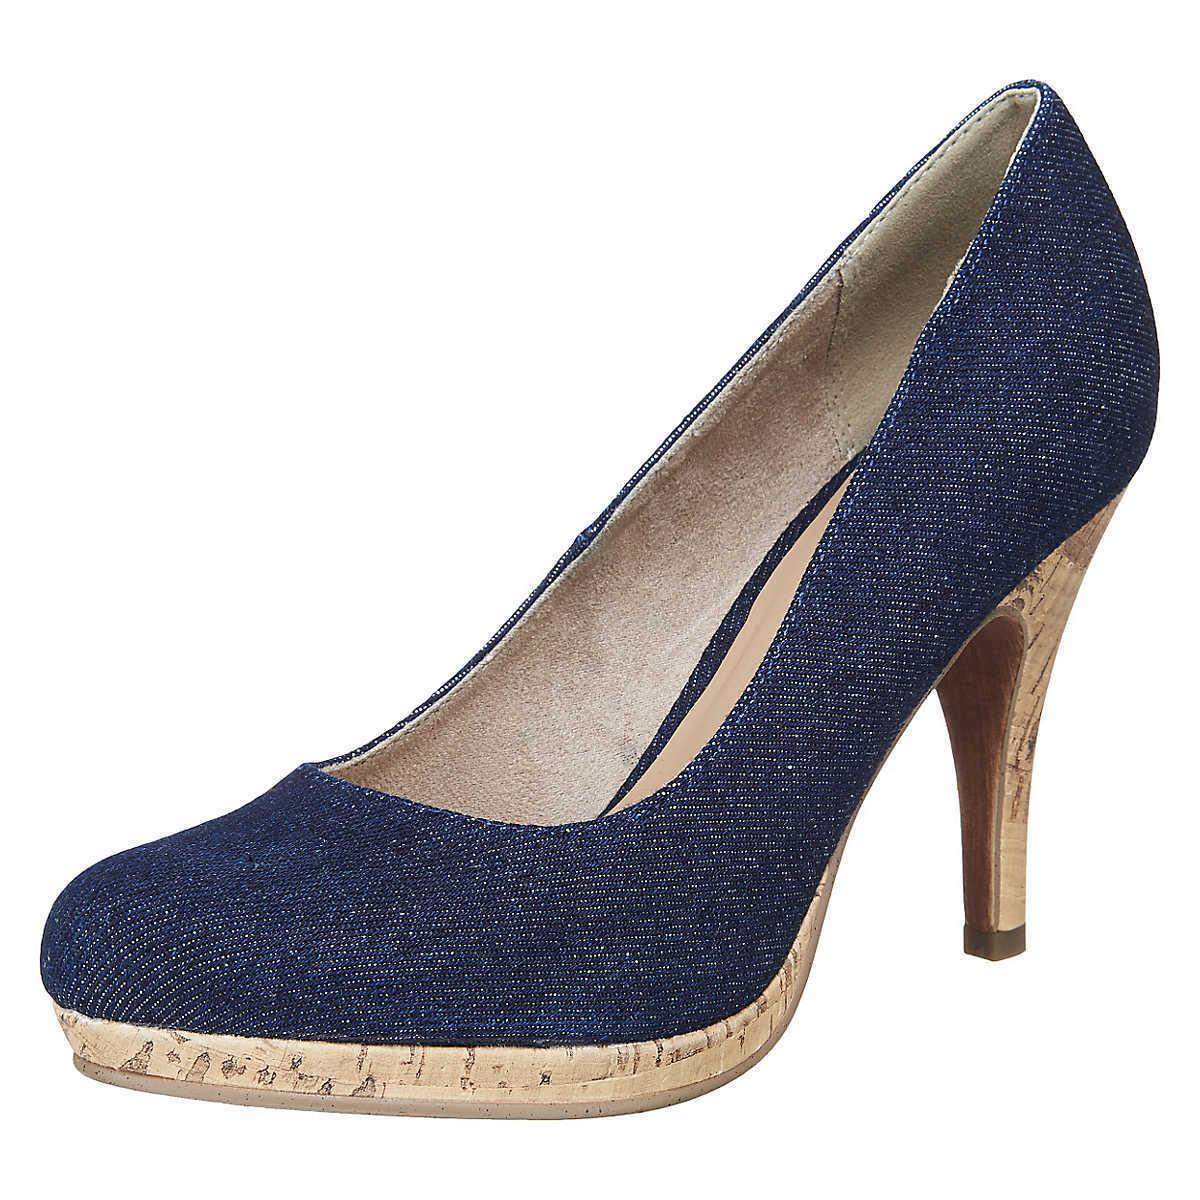 Tamaris Damen Pumps Damenschuhe, blau, EUR 38